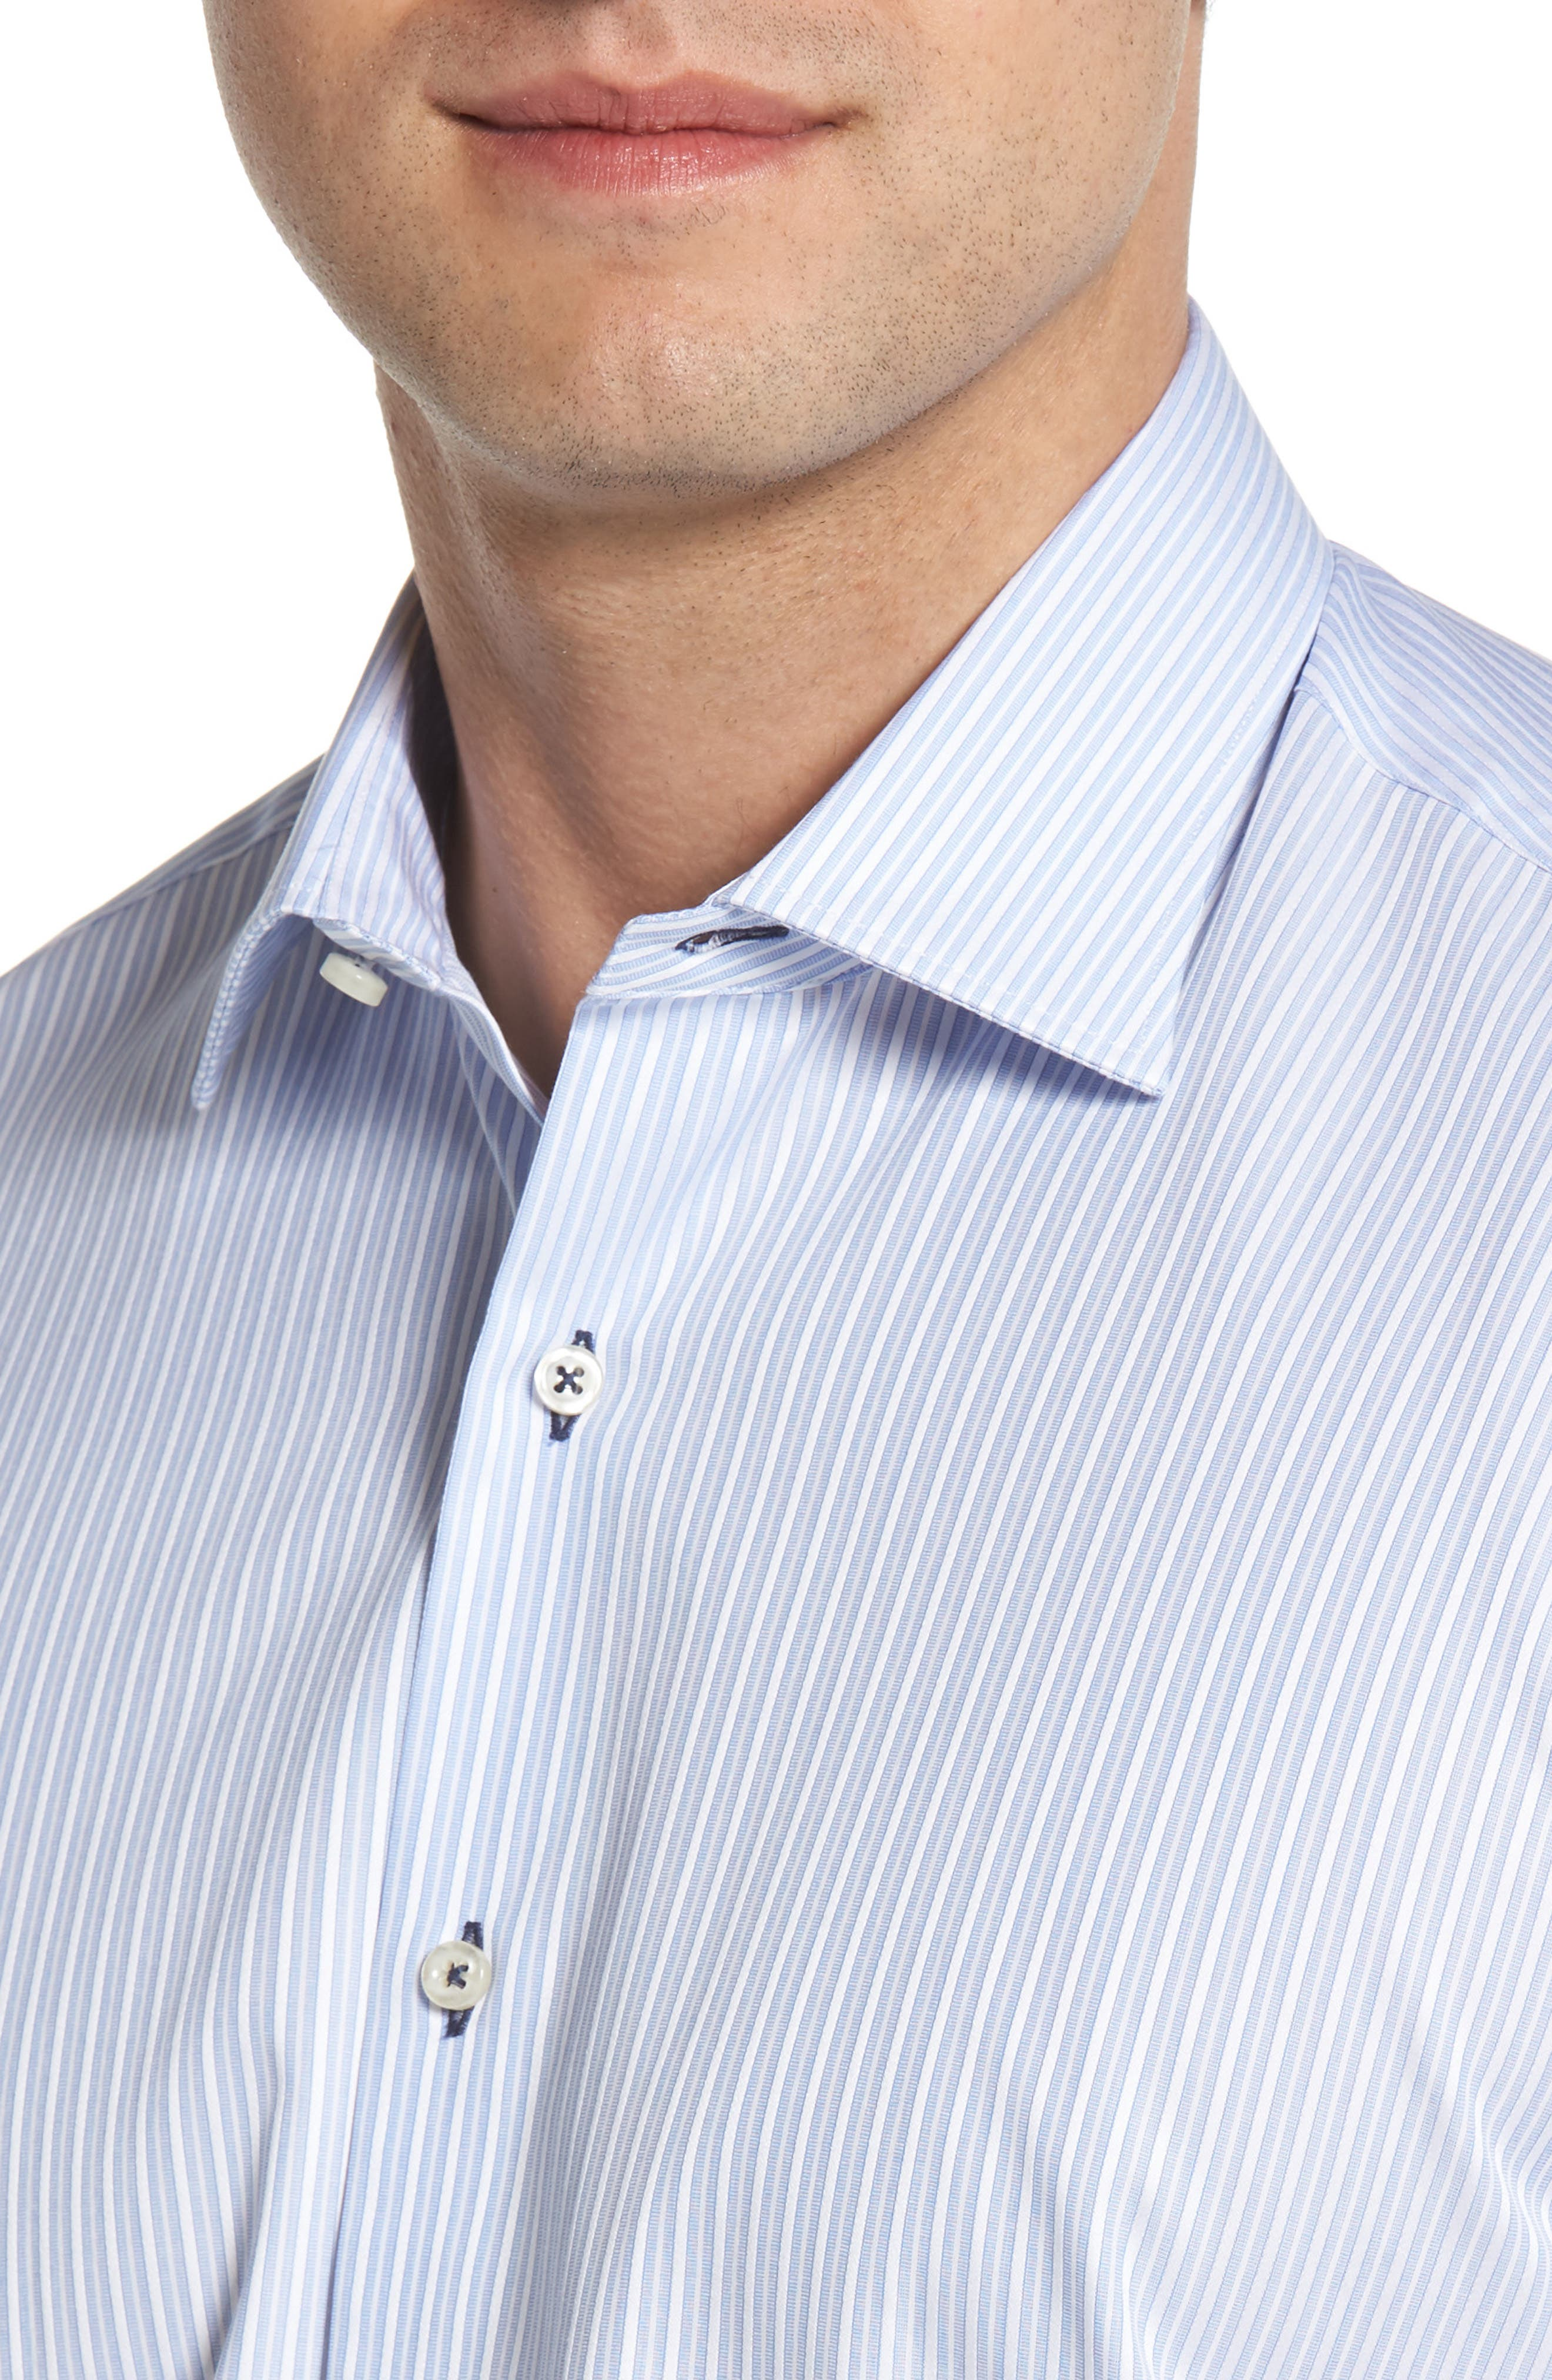 Regular Fit Stripe Dress Shirt,                             Alternate thumbnail 2, color,                             LIGHT BLUE